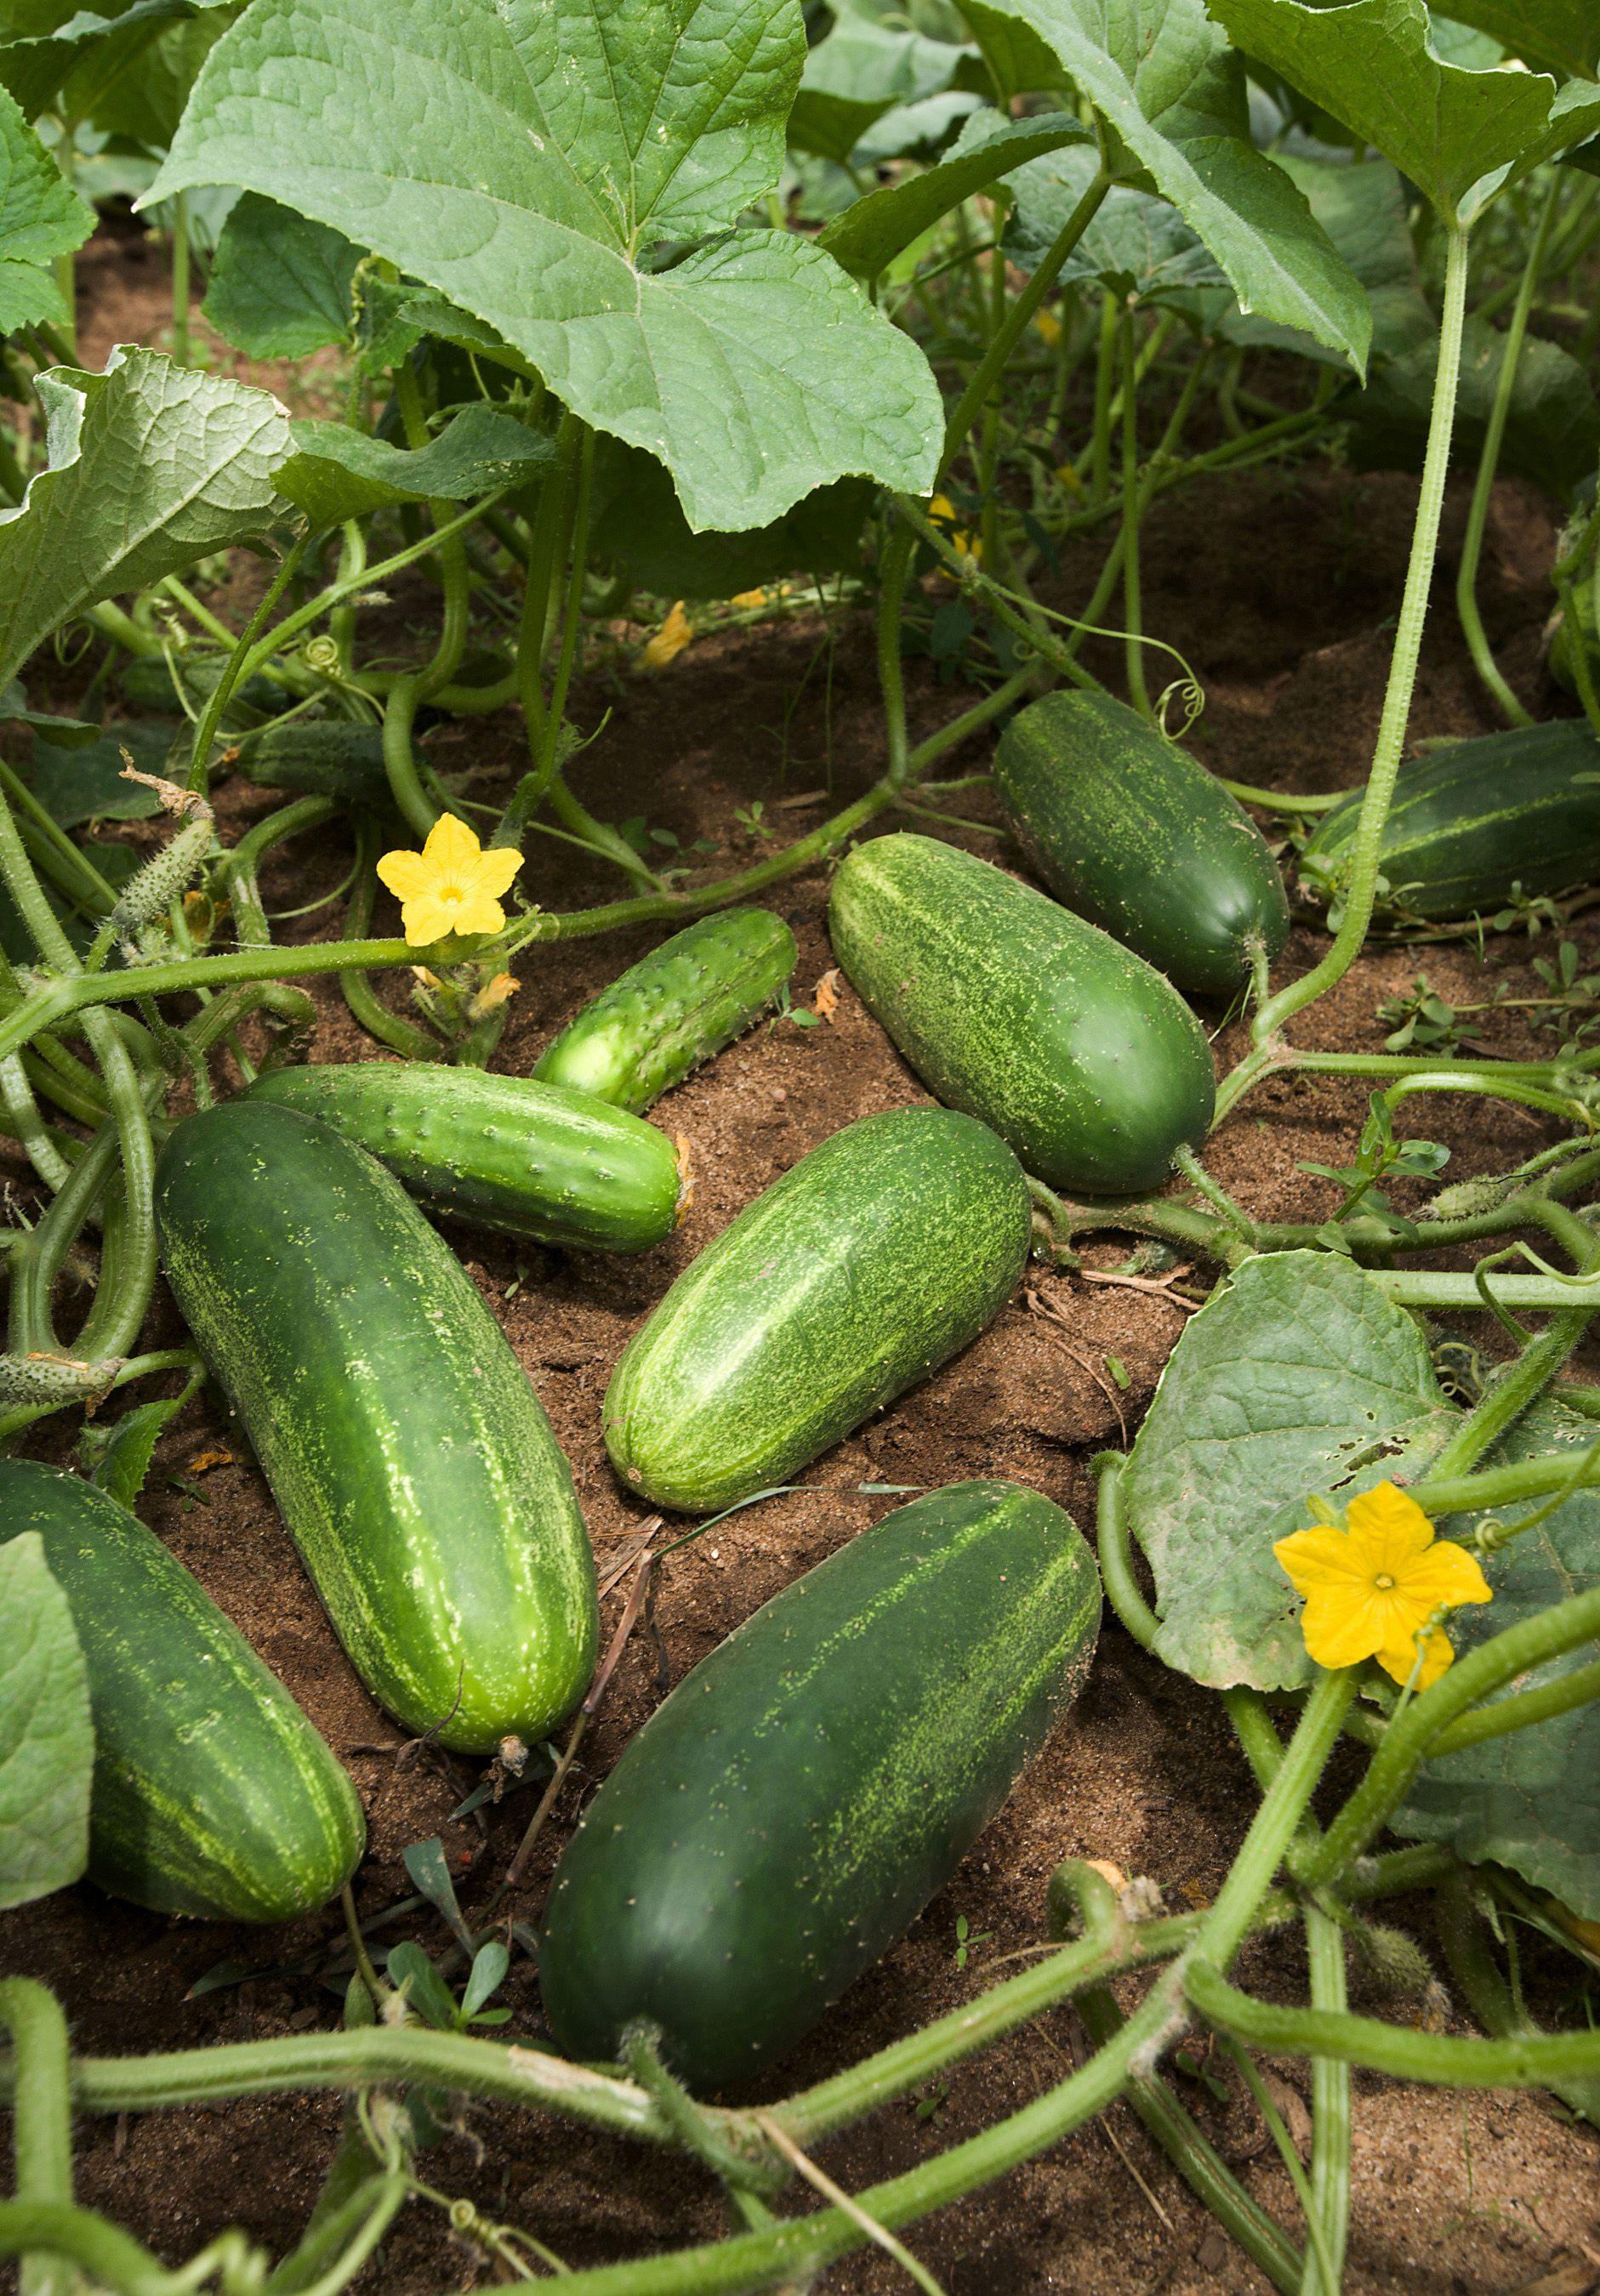 Melones y pepinos online dating